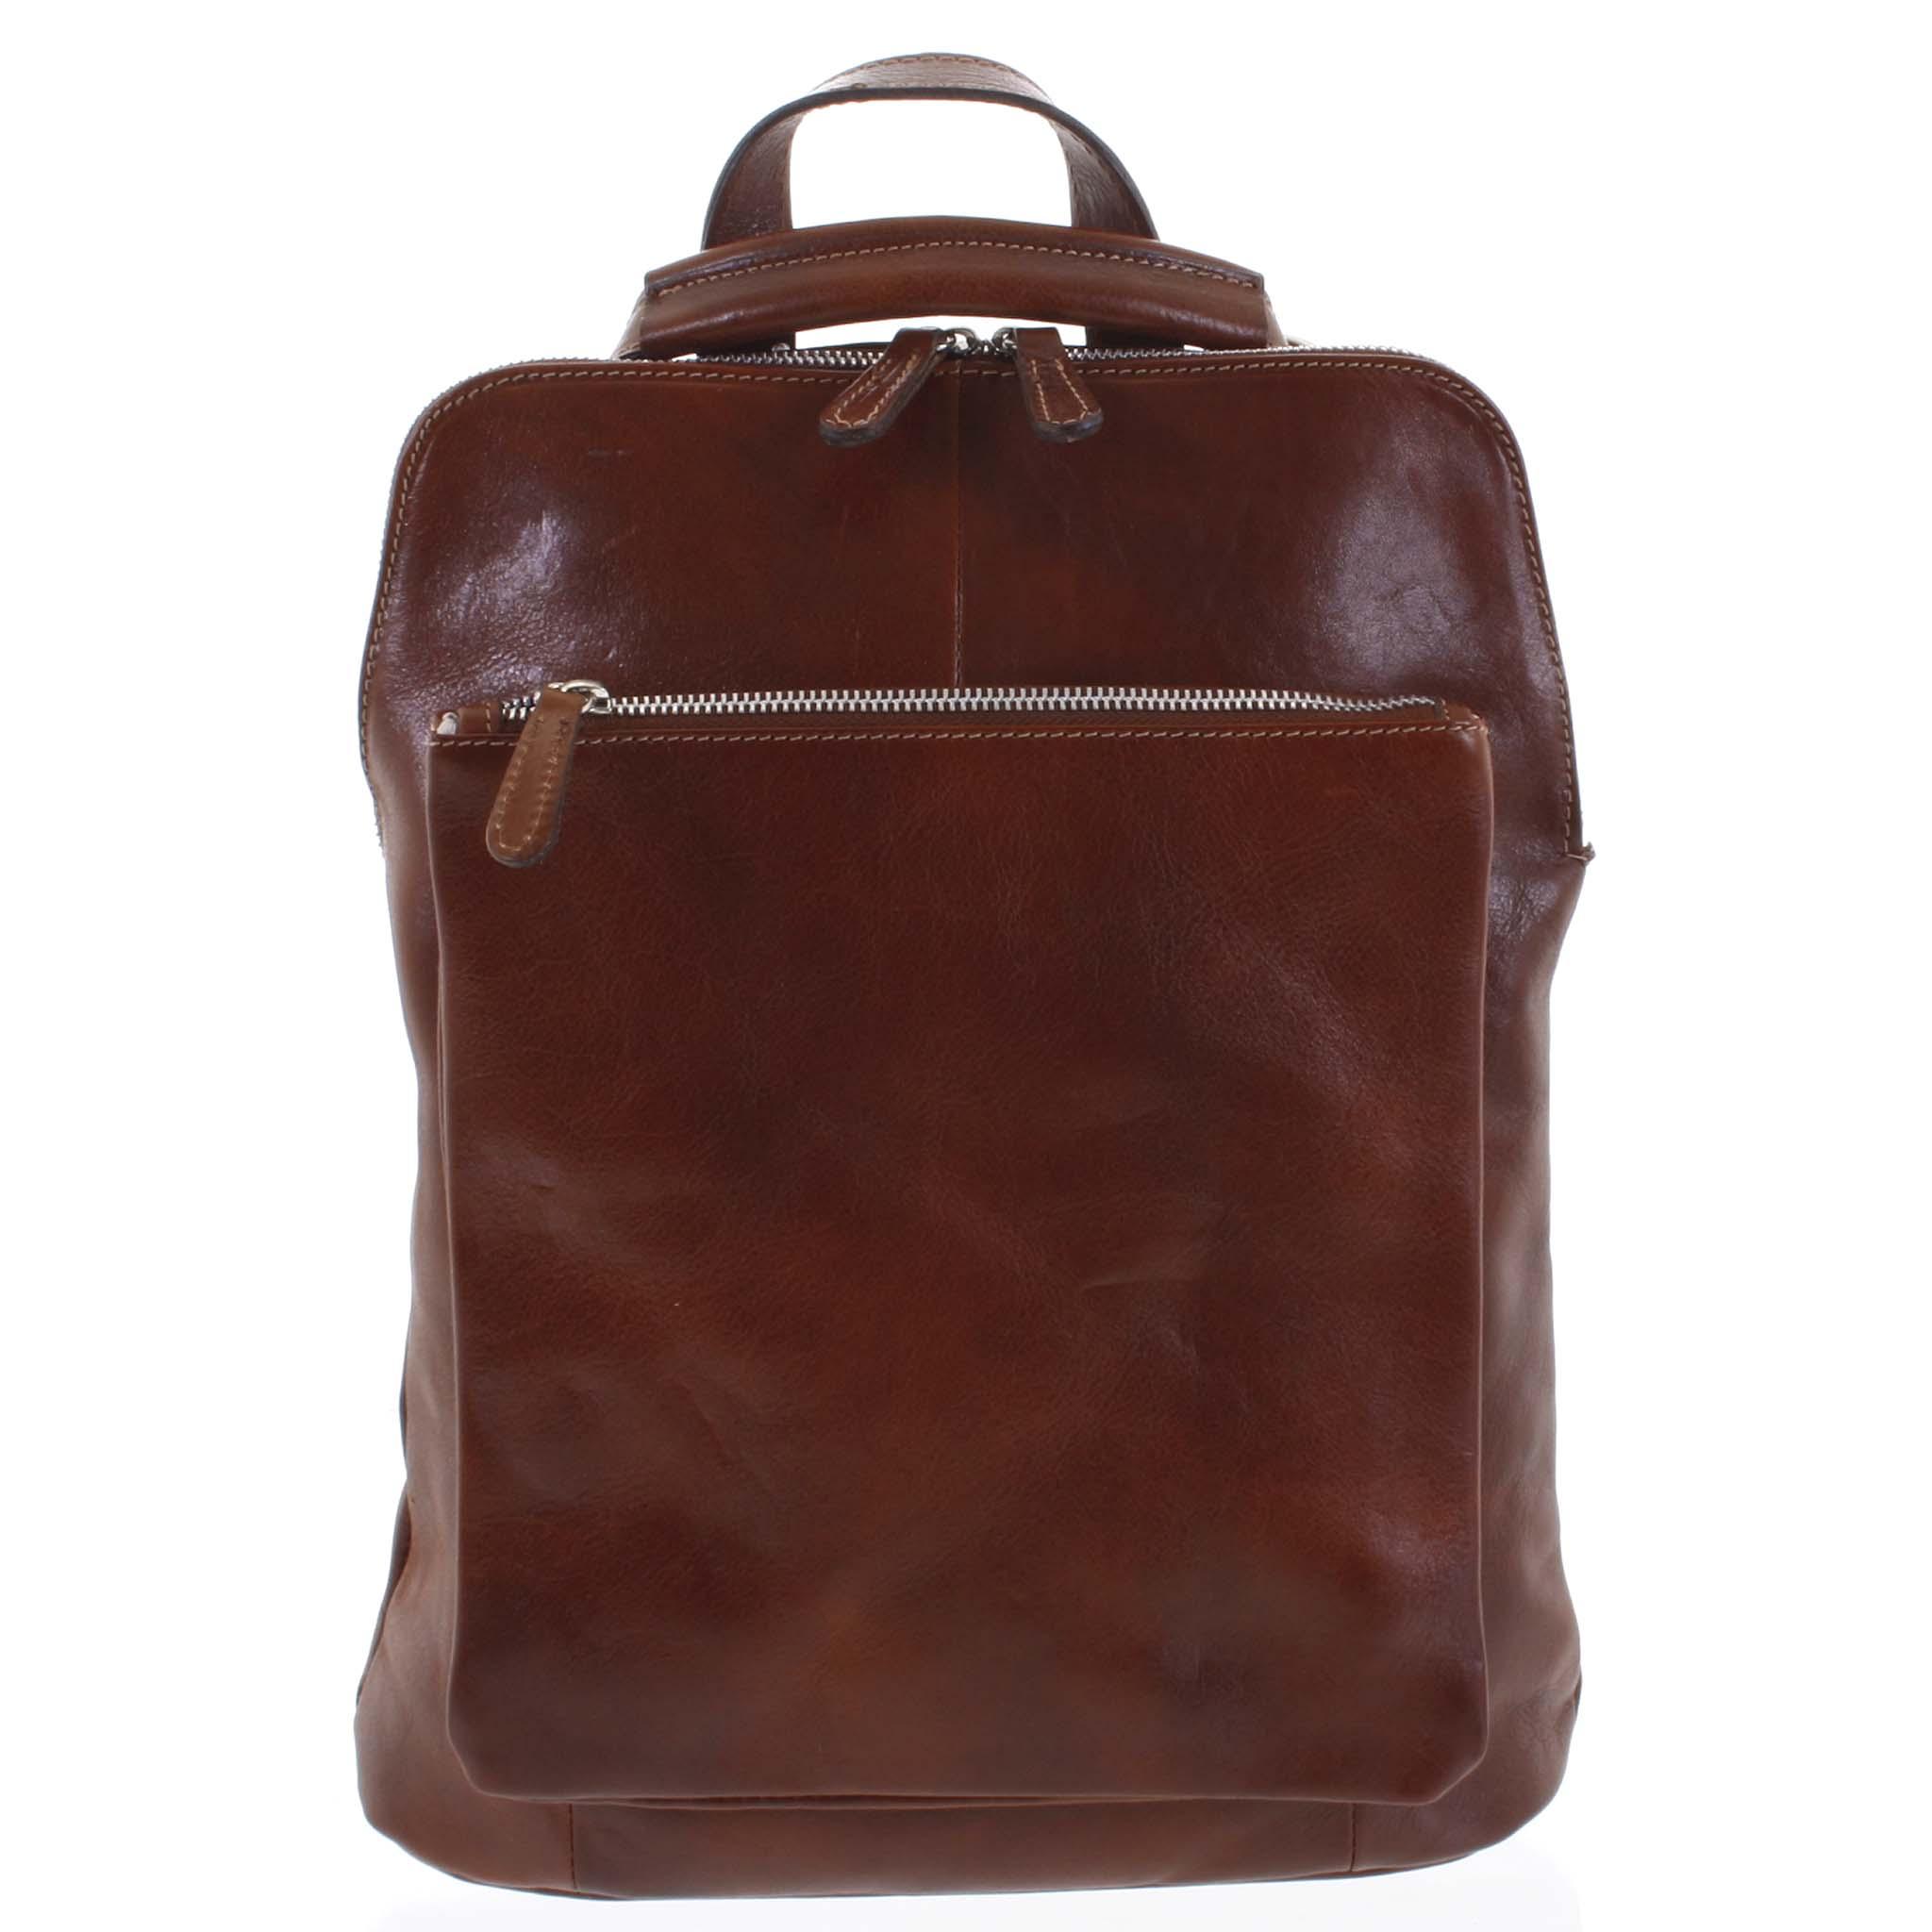 Dámsky kožený batoh kabelka hnedý - ItalY Englidis hnedá